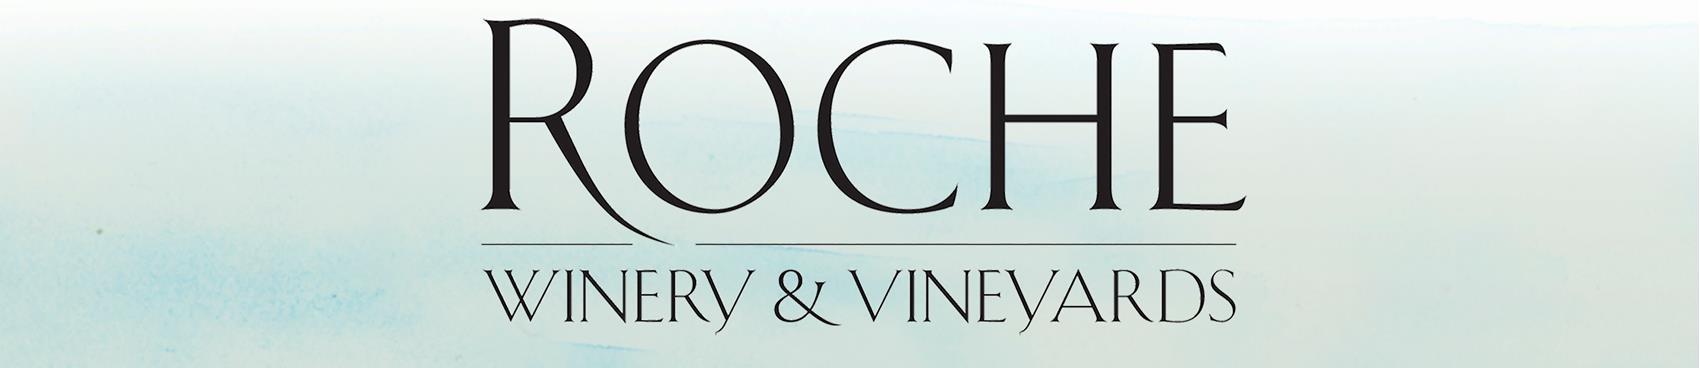 Roche Winery Tasting Room